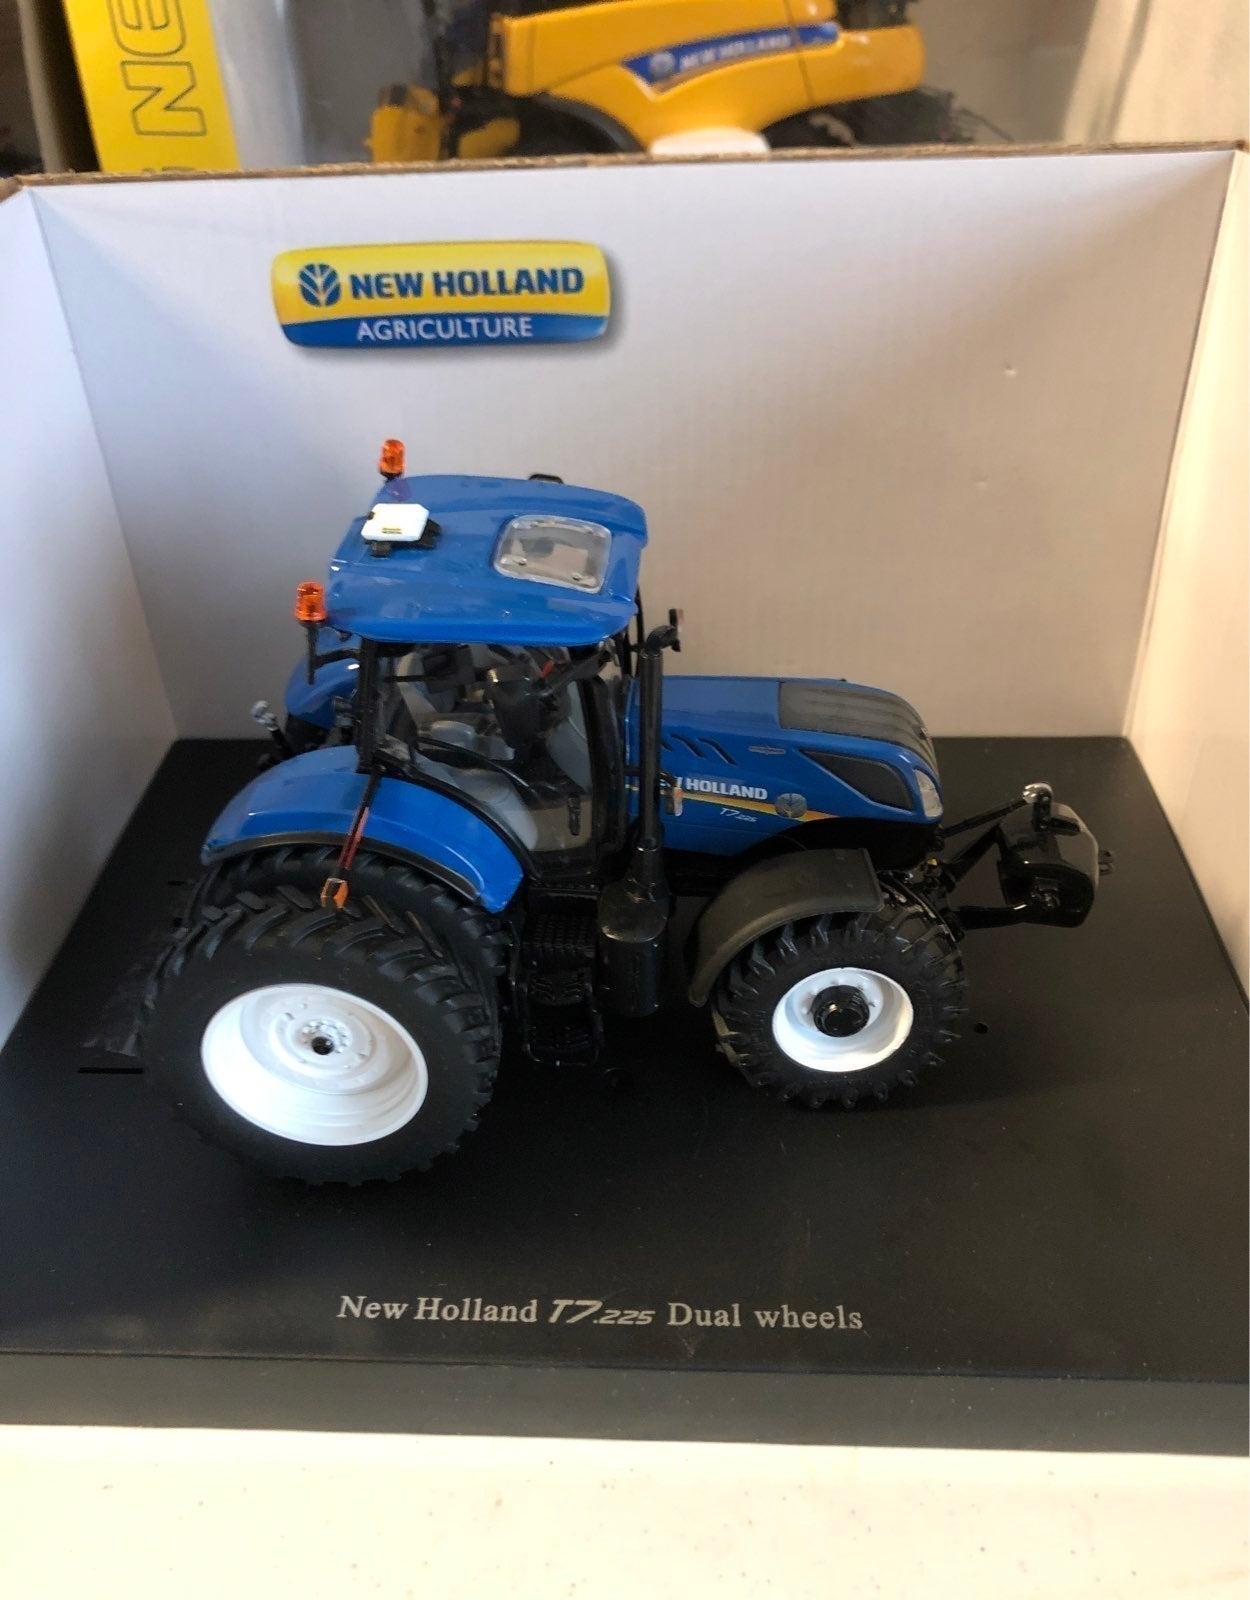 New holland T7.225 dual wheels 1:32